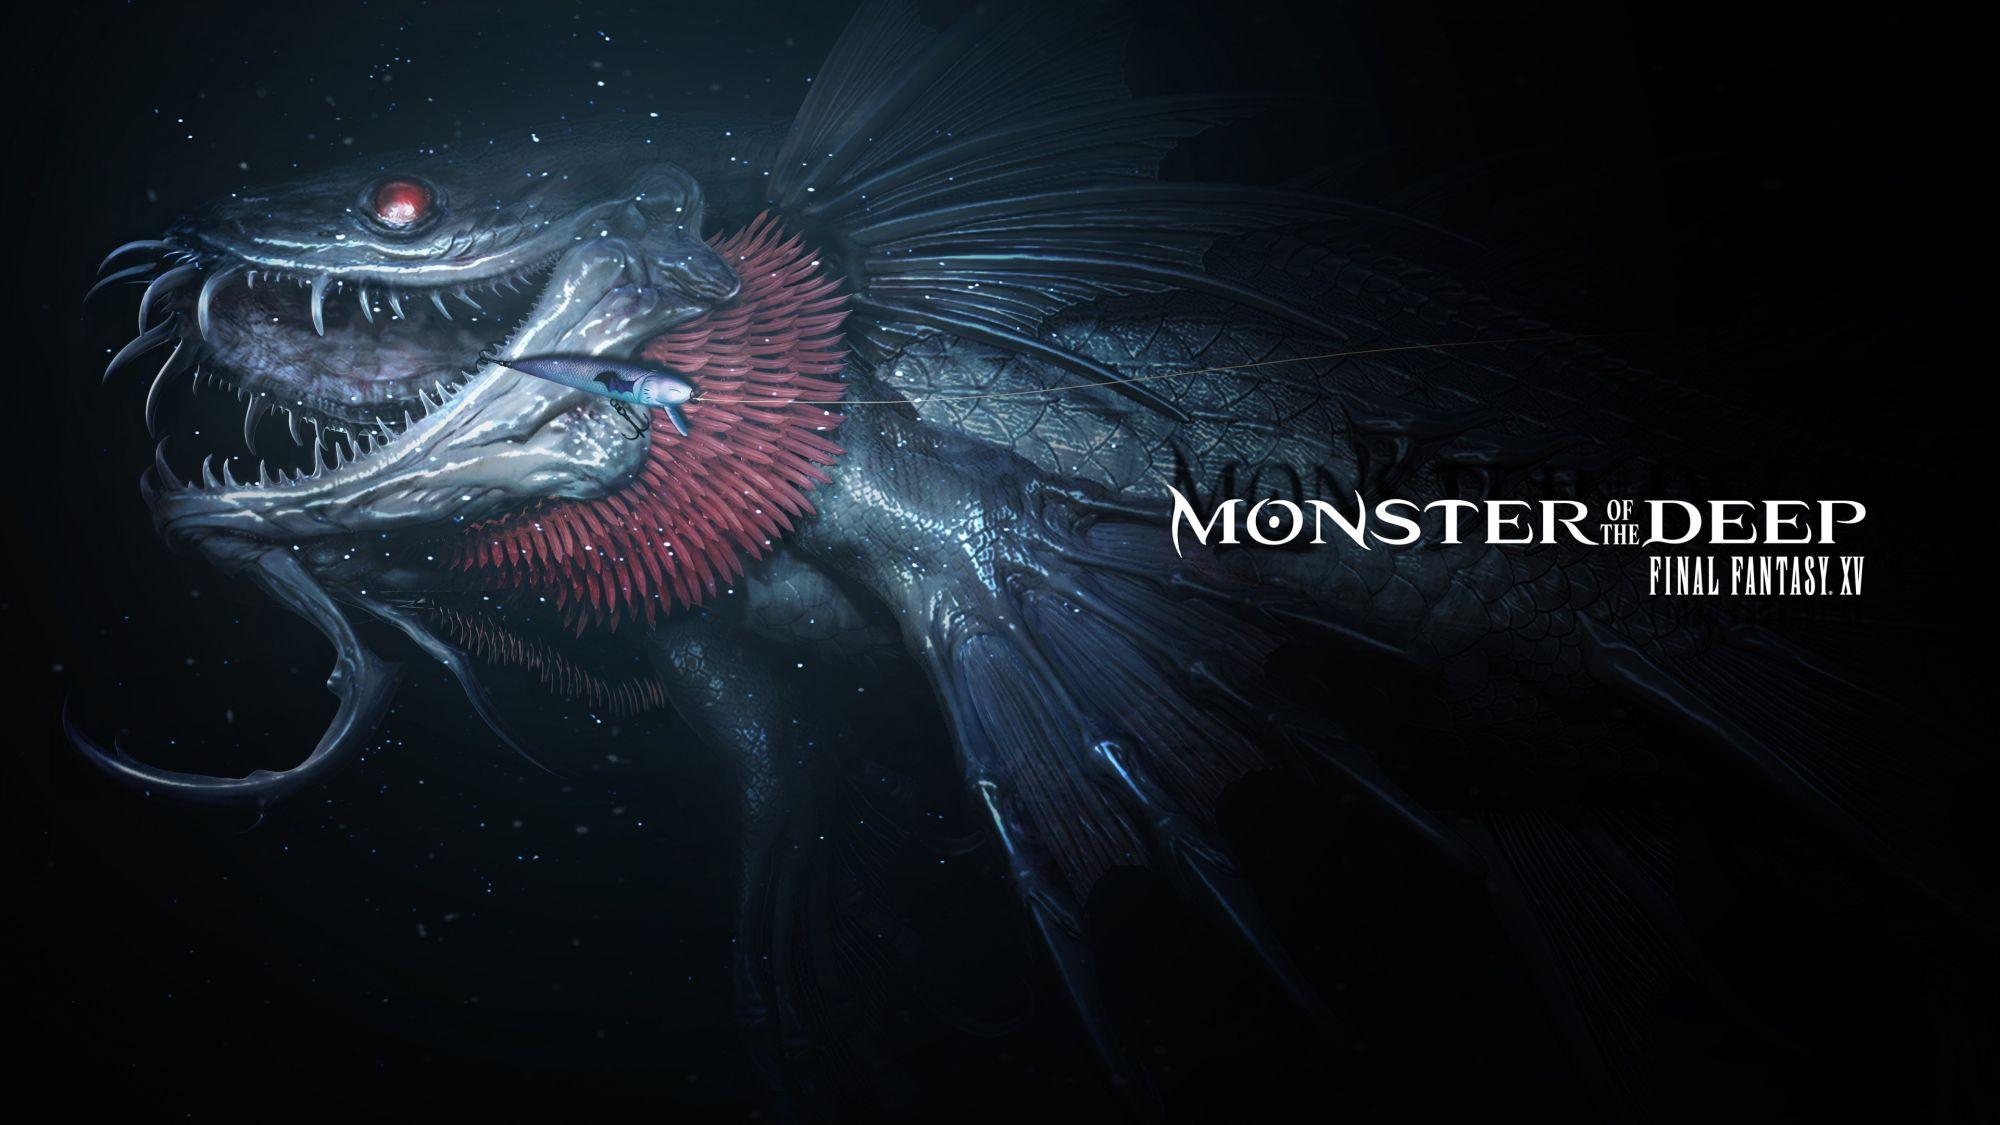 monster-of-the-deep-final-fantasy-xv-e3-2017-